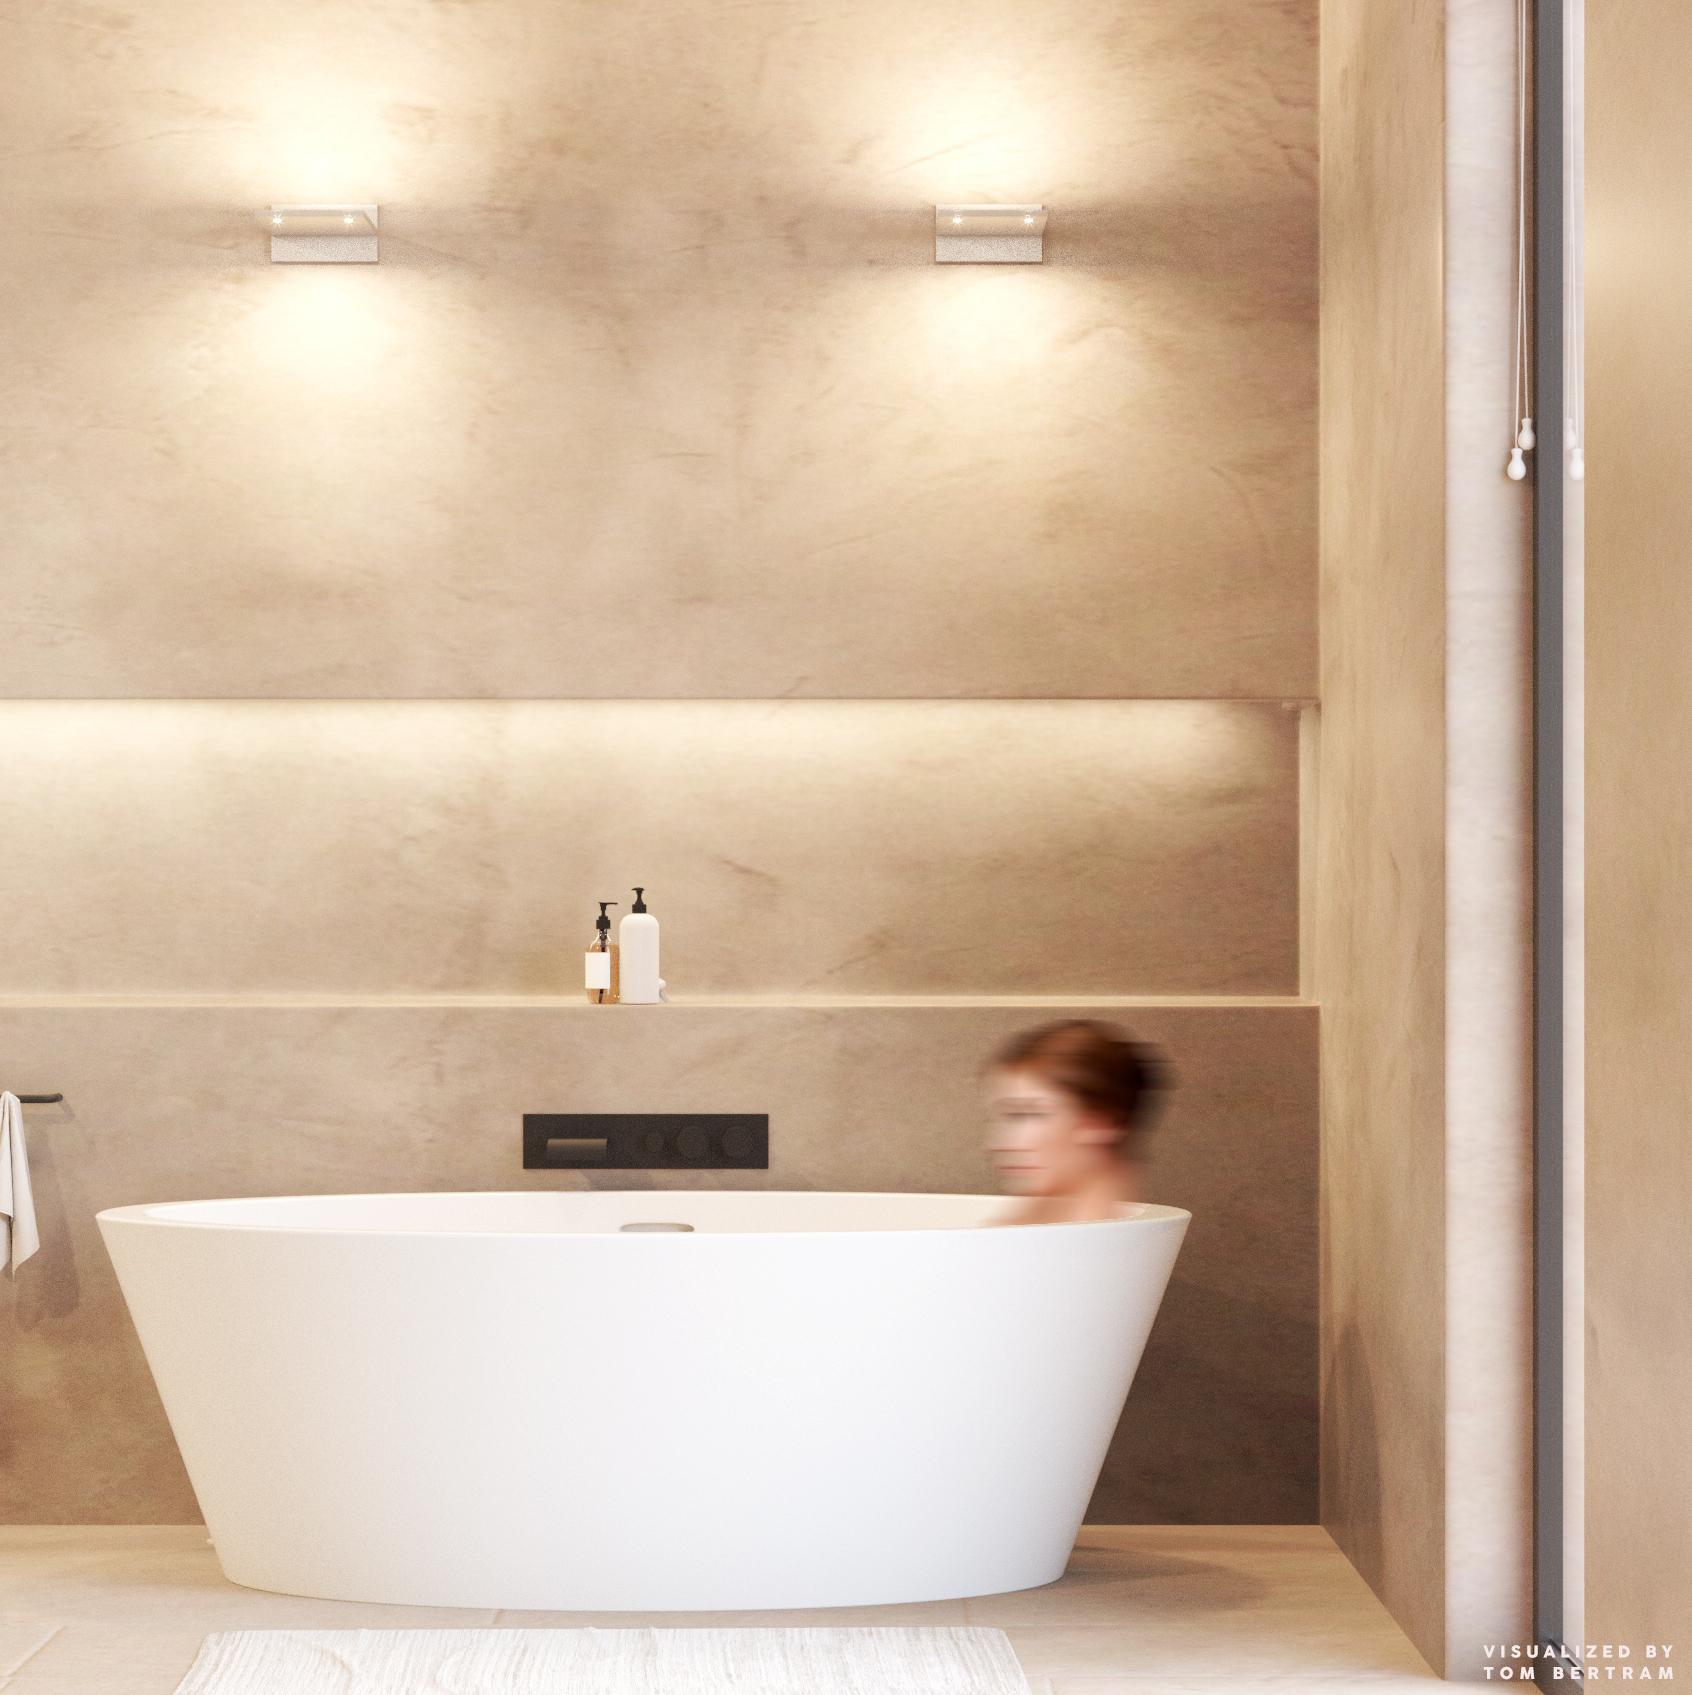 PIXEL Wall Basic FERROLIGHT impressie   Hoogebeen Interieur